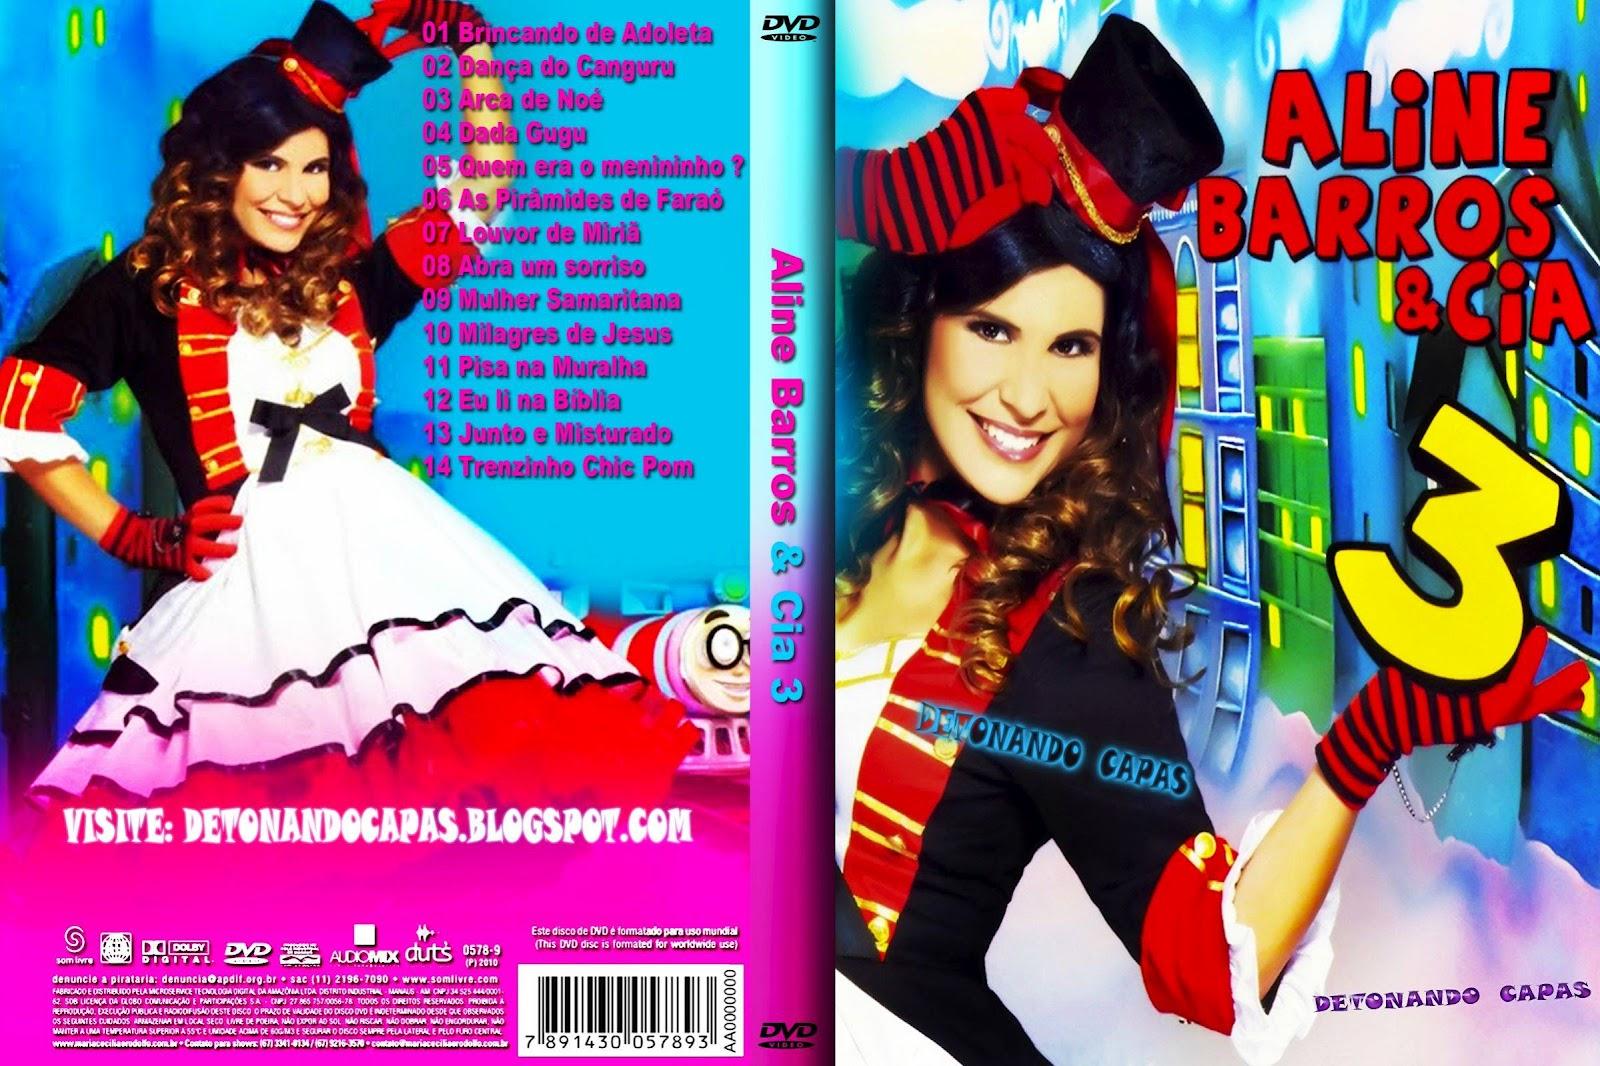 Aline Barros Aline Barros & Cia 2 treffpunkteltern.de :: thema anzeigen - dvd aline barros e